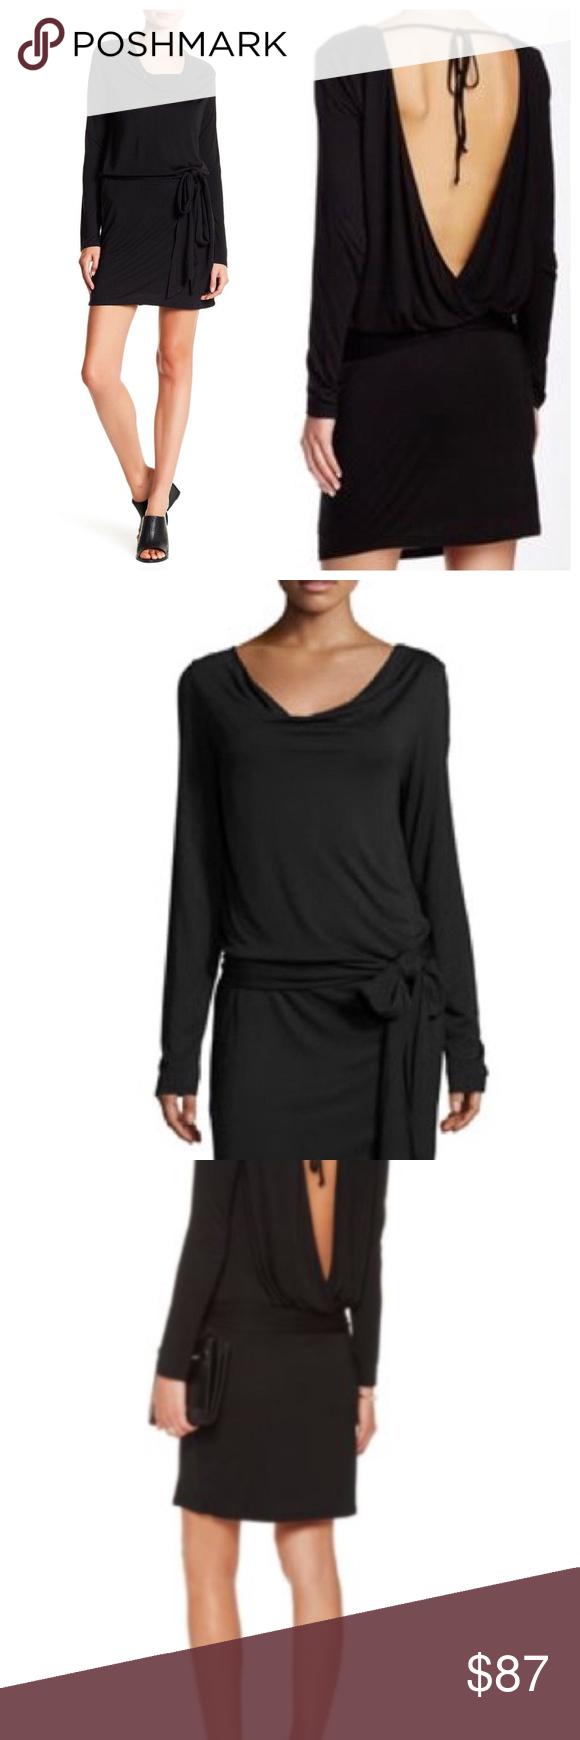 New haute hippe black wrap effect modal dress nwt faux wrap dress